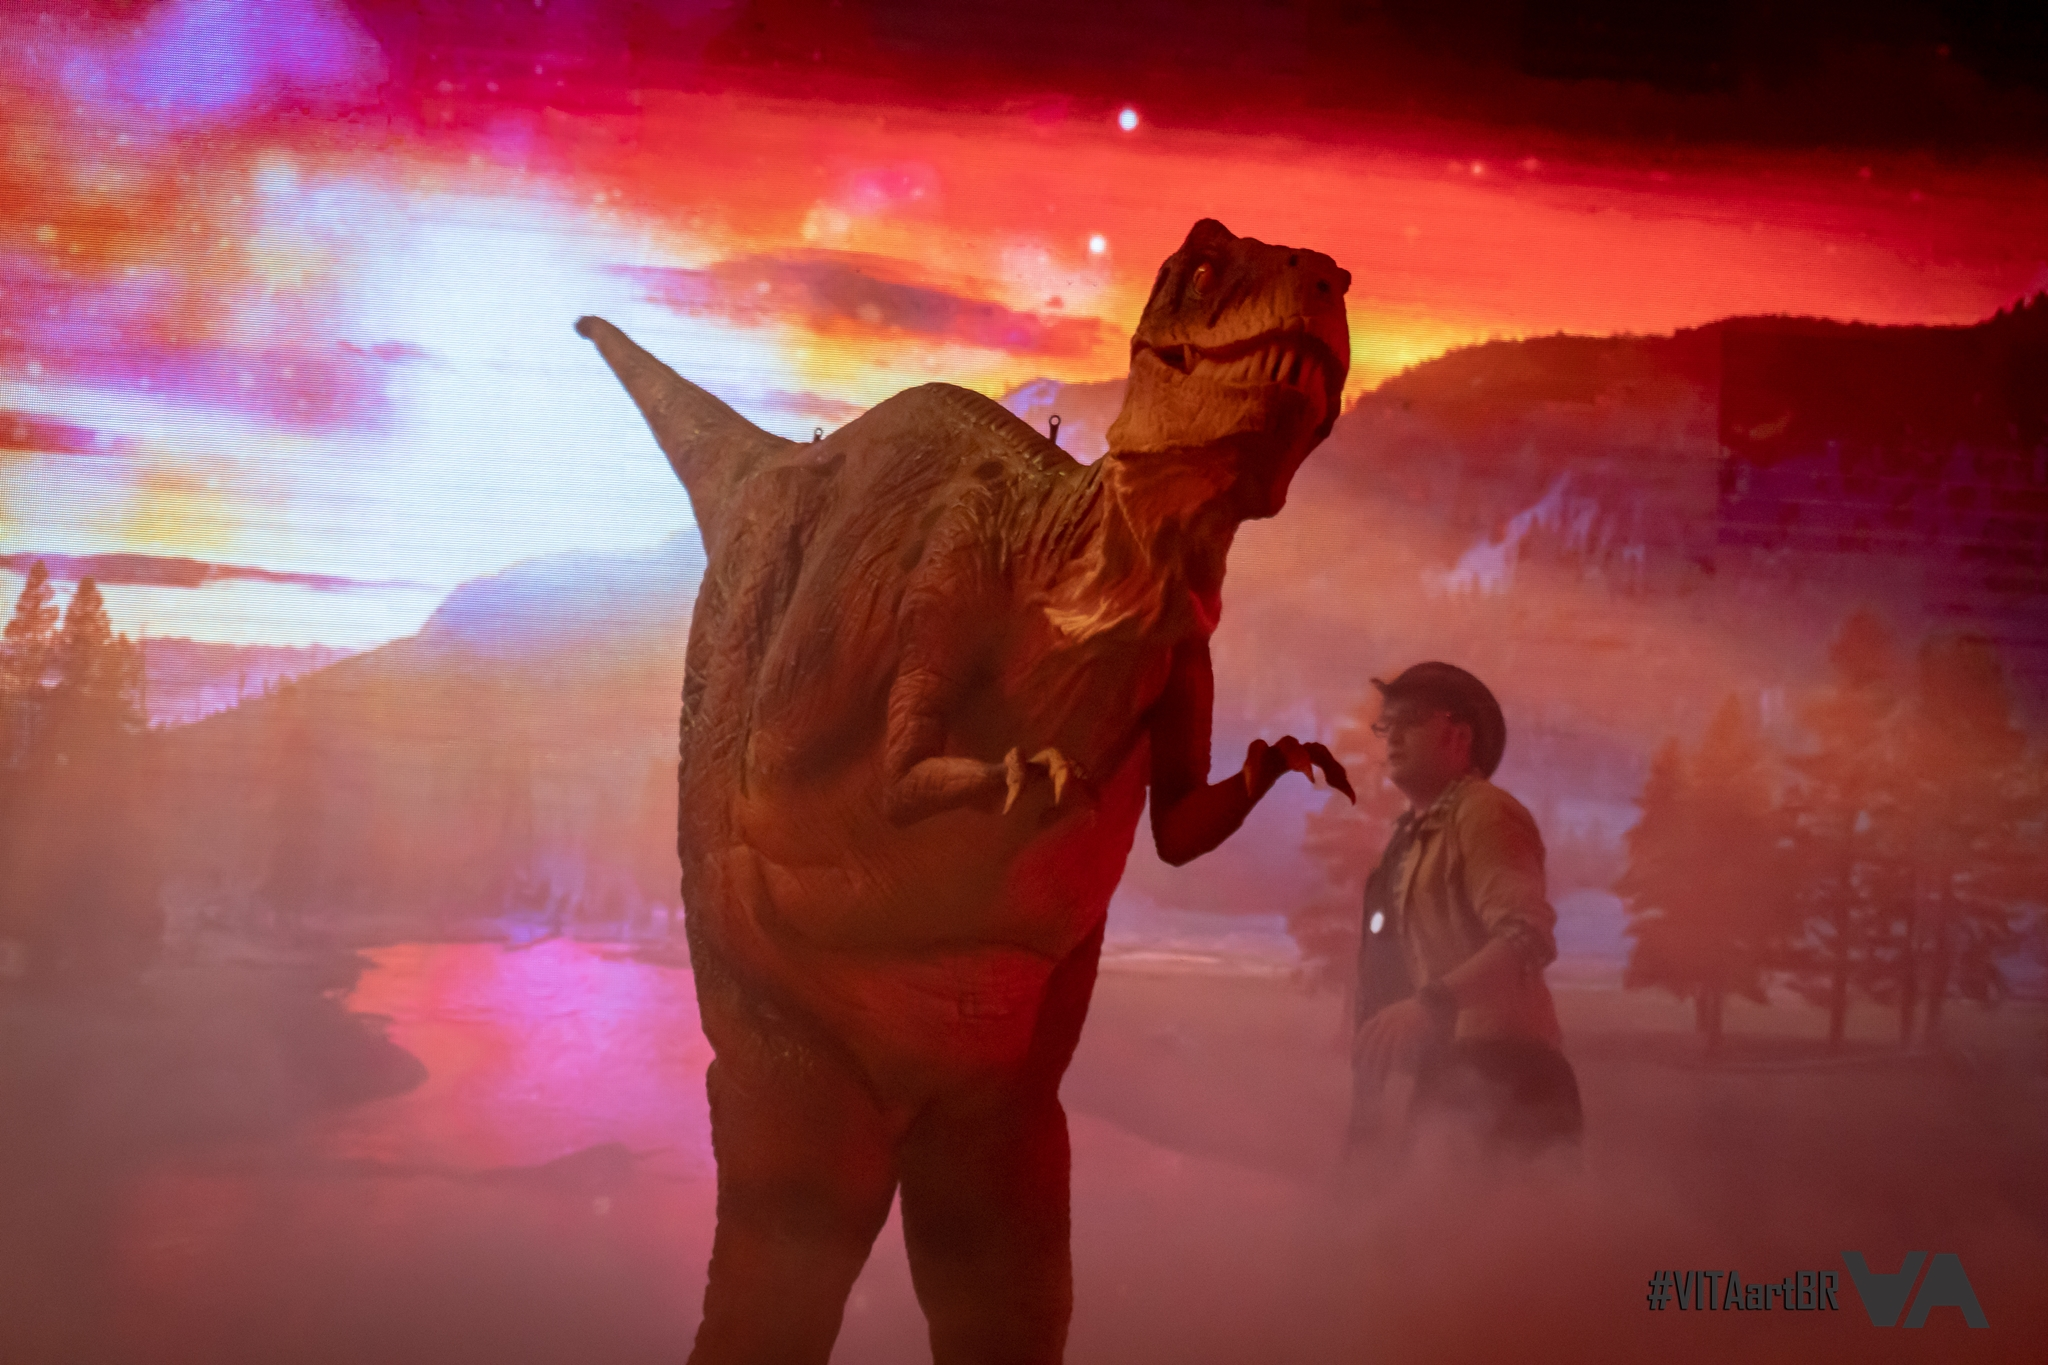 VITAartBR - DinosExperience - 48